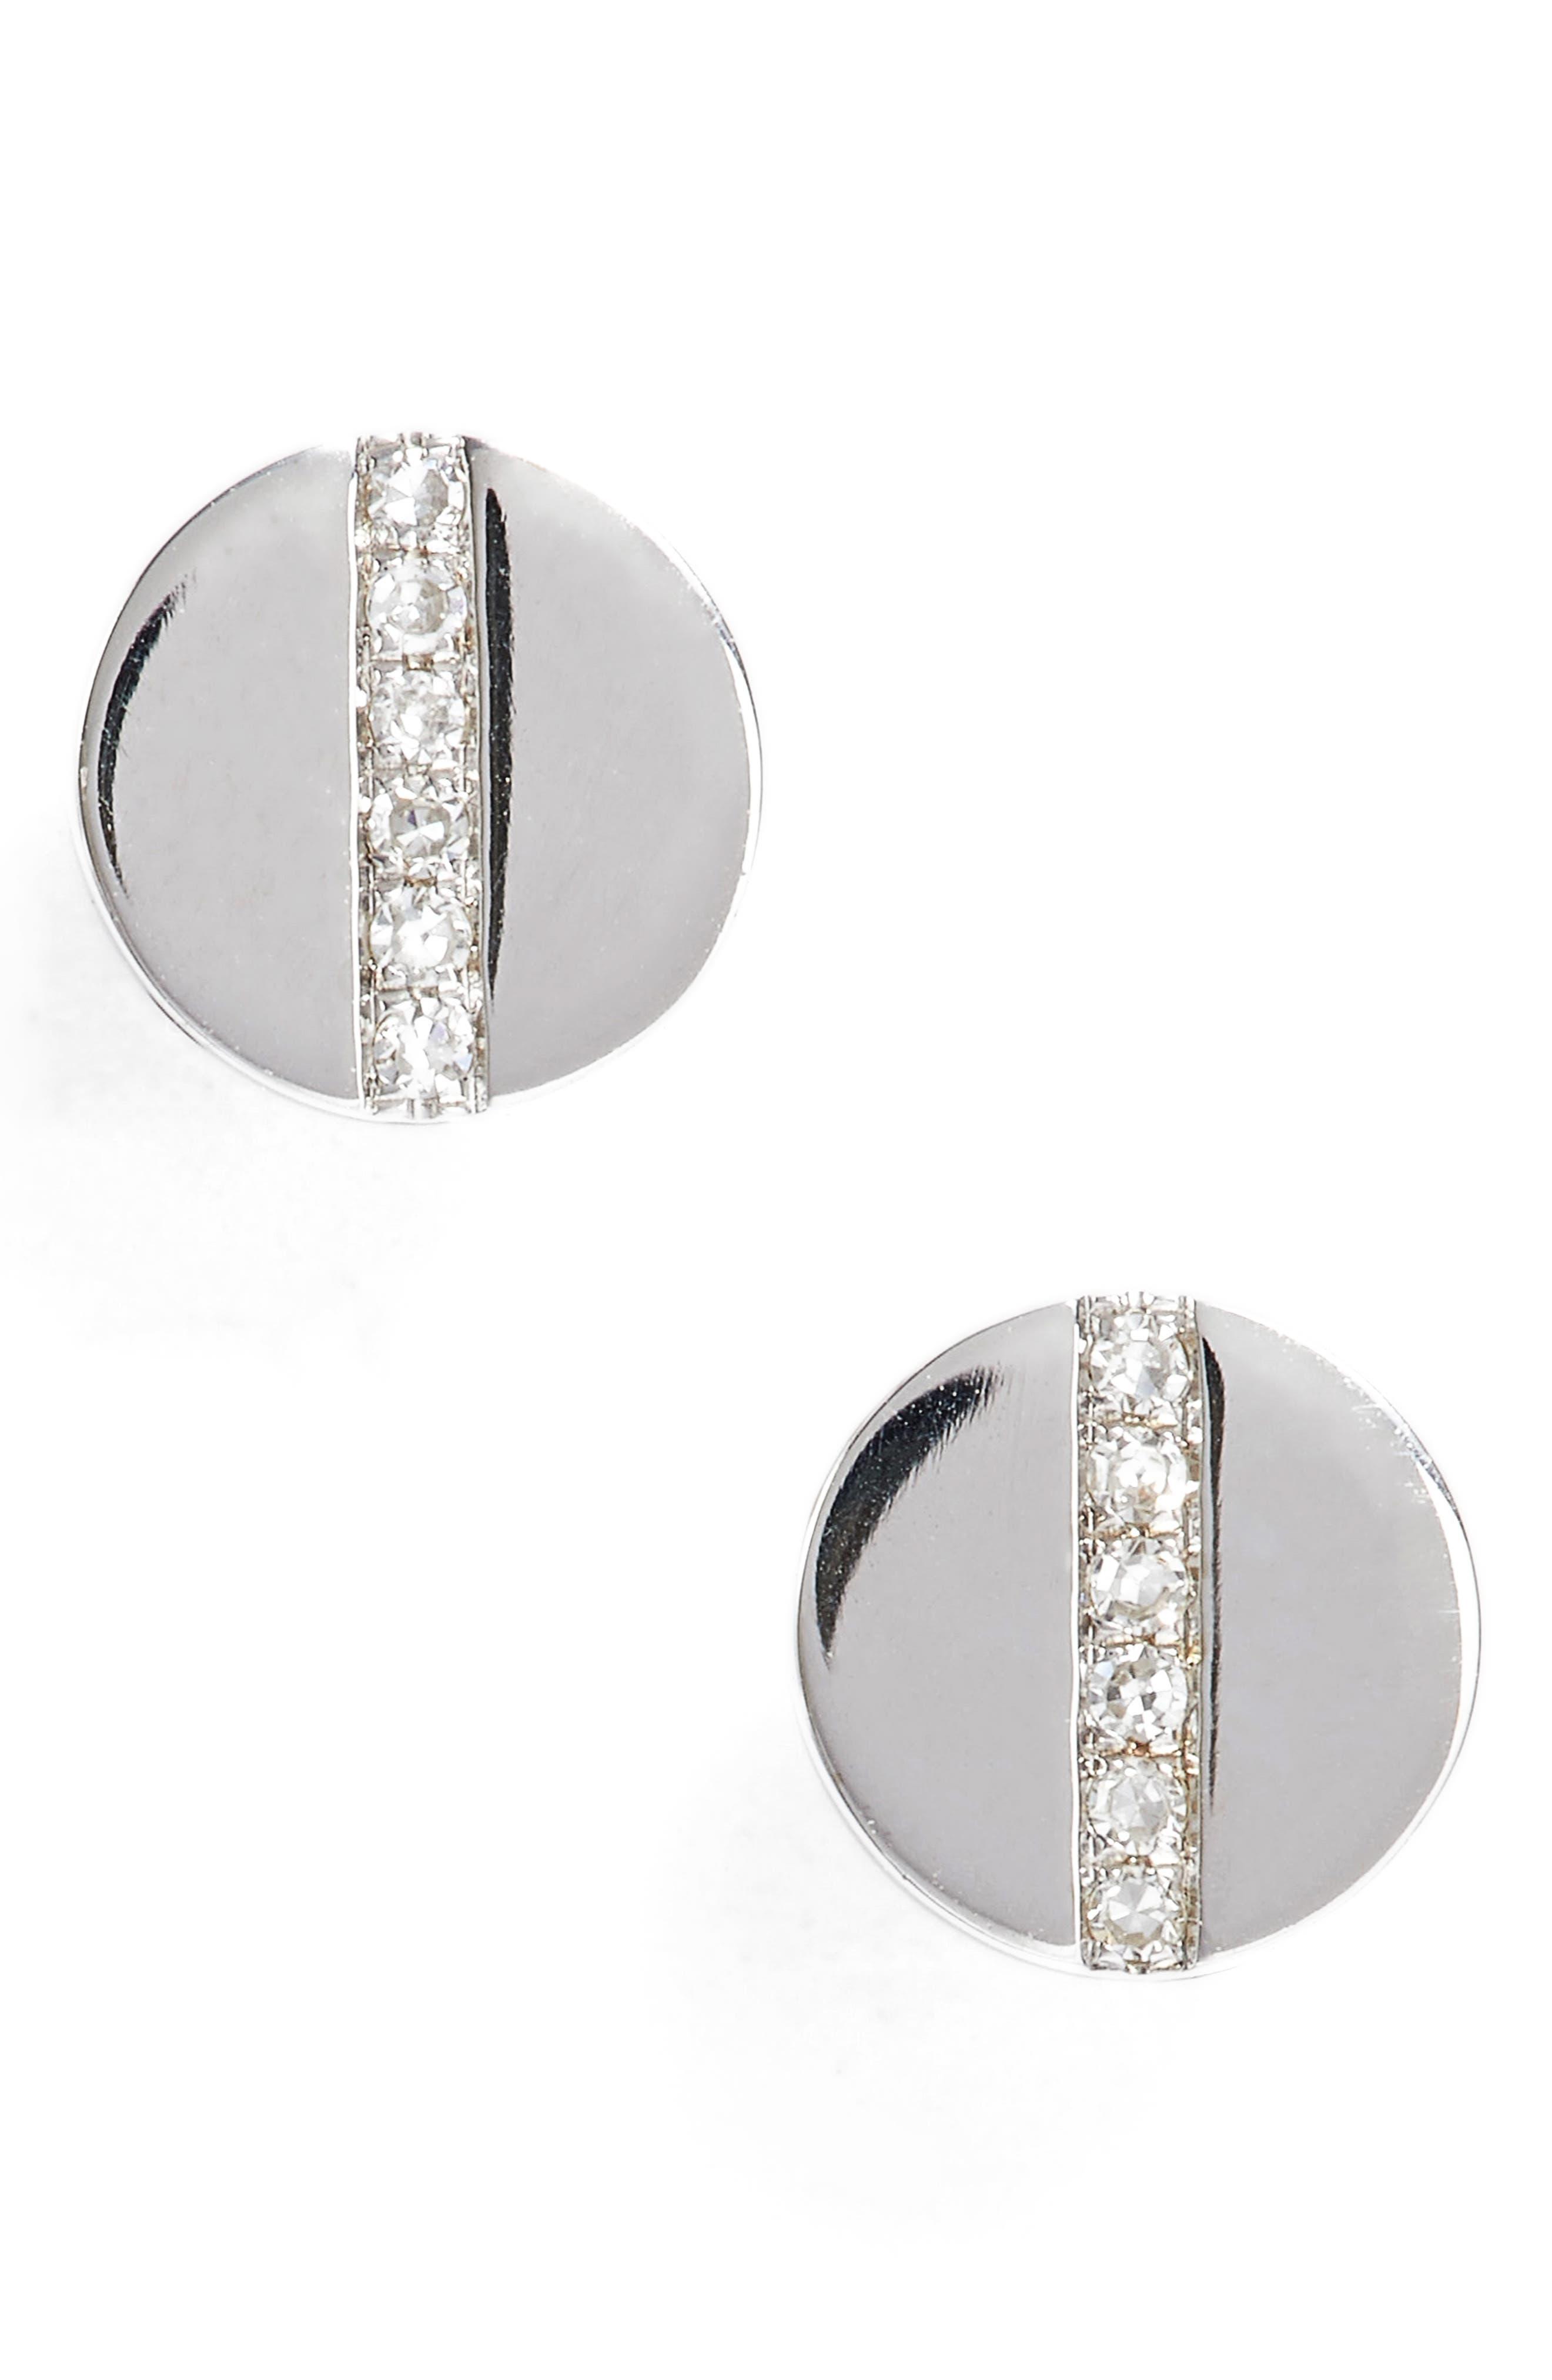 Main Image - EF COLLECTION Screw Diamond Stud Earrings